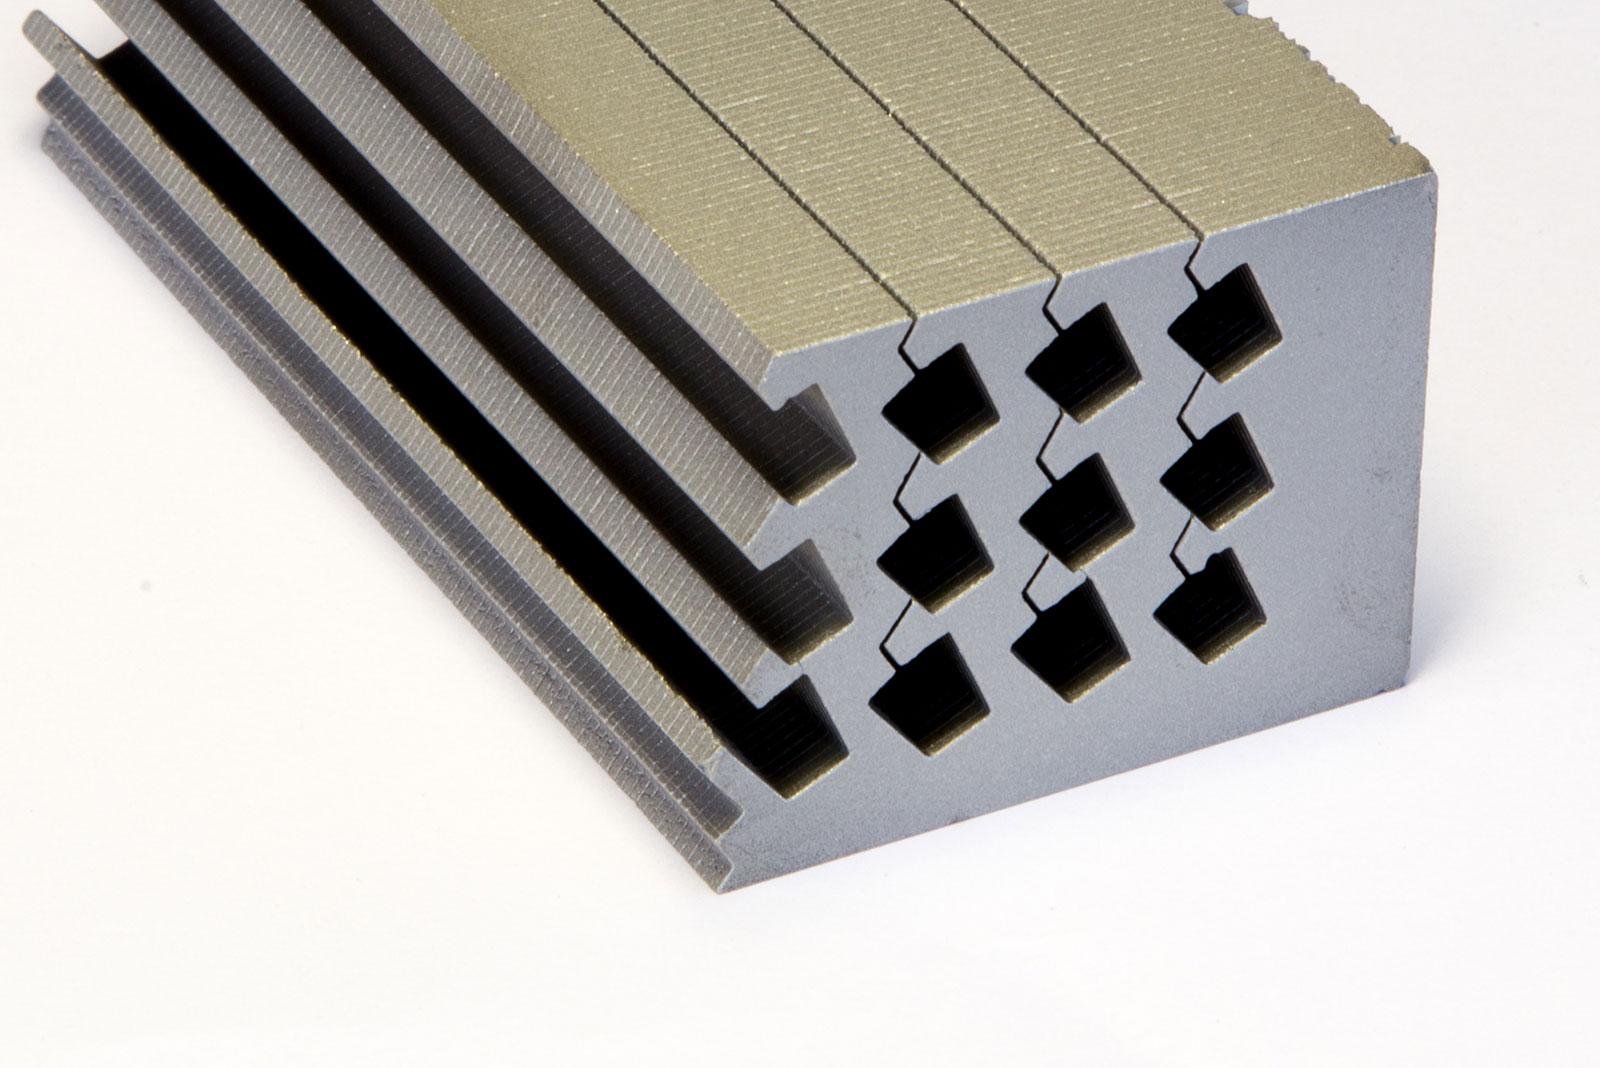 L 型叠片磁铁